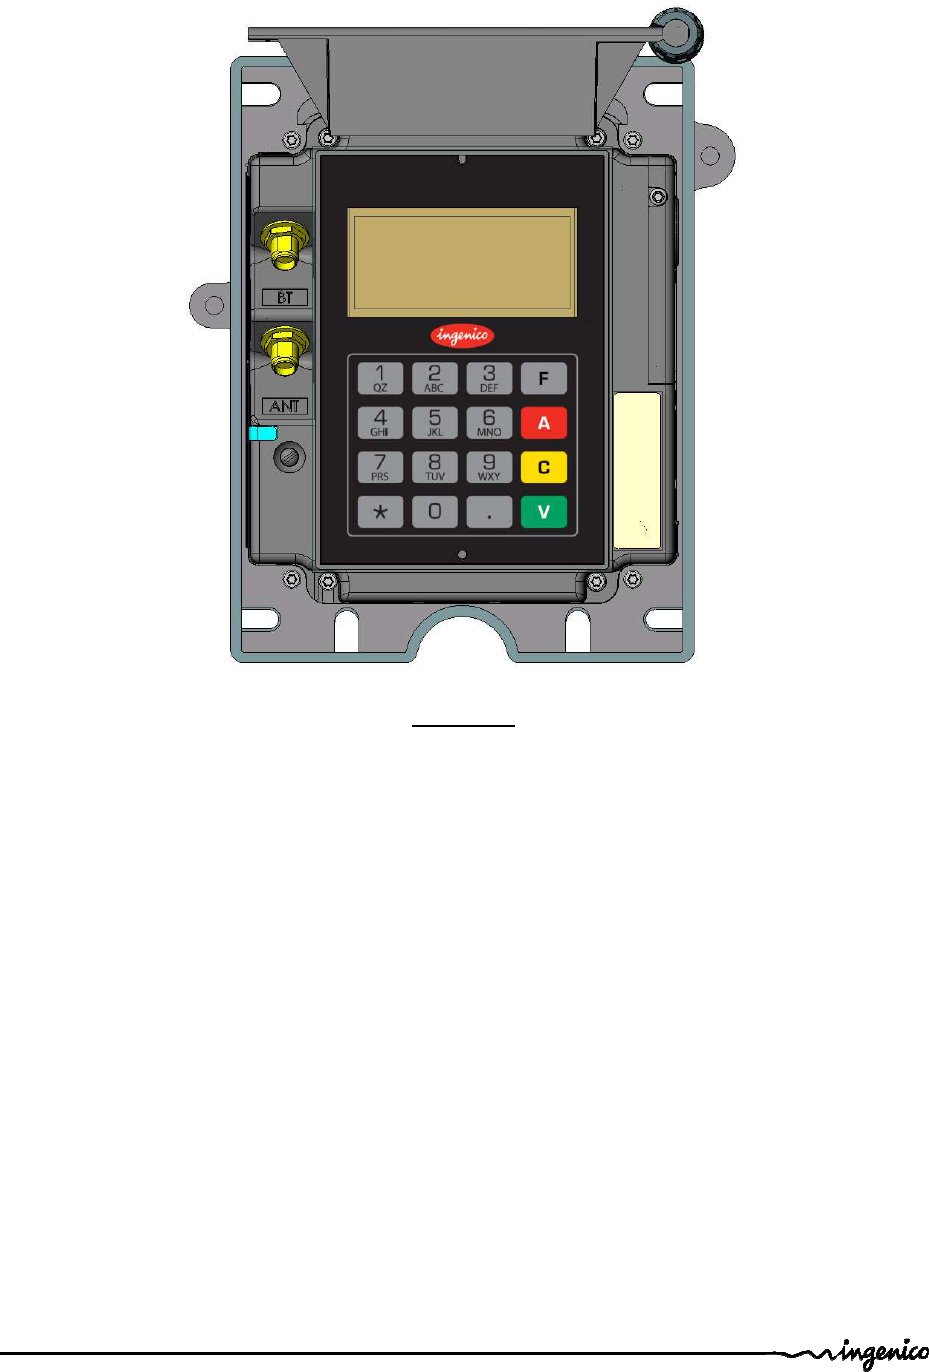 INGENICO IUC18X-RF Payment Terminal User Manual Manual